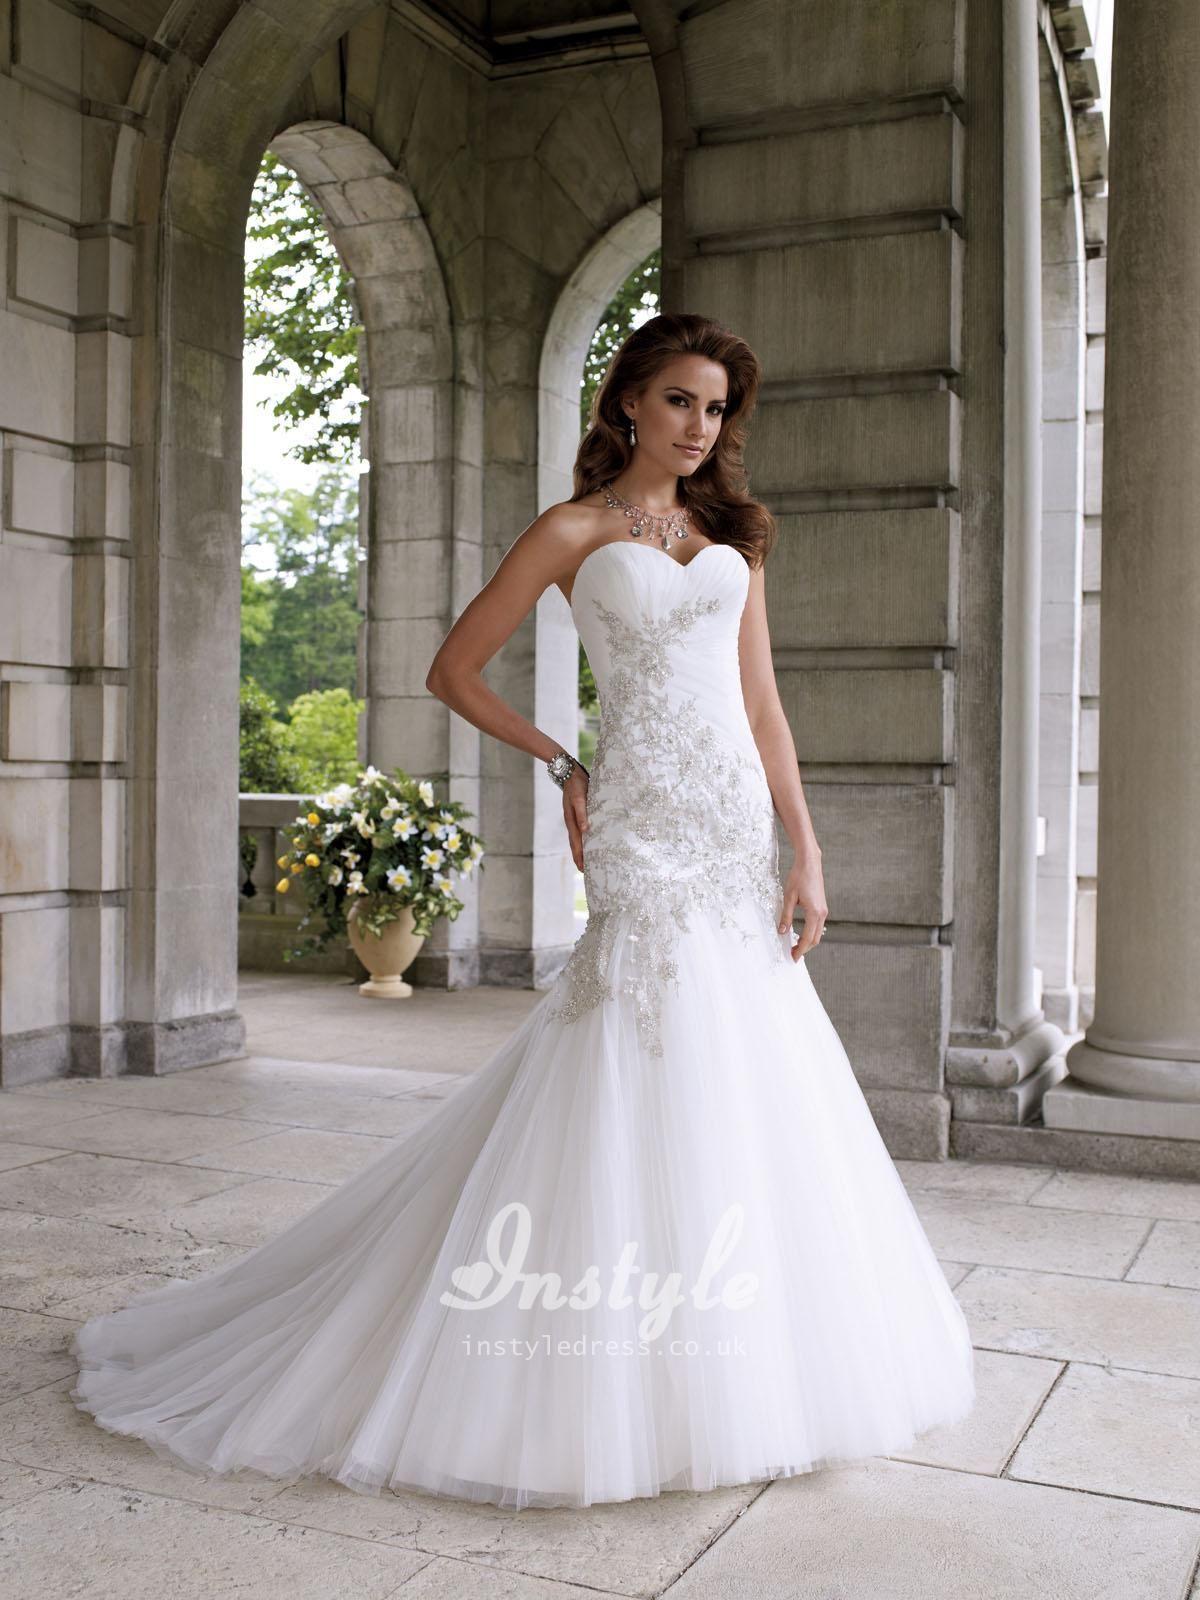 Beaded Mermaid Wedding Gowns Western Dress Uk With Sweetheart Neckline Hand